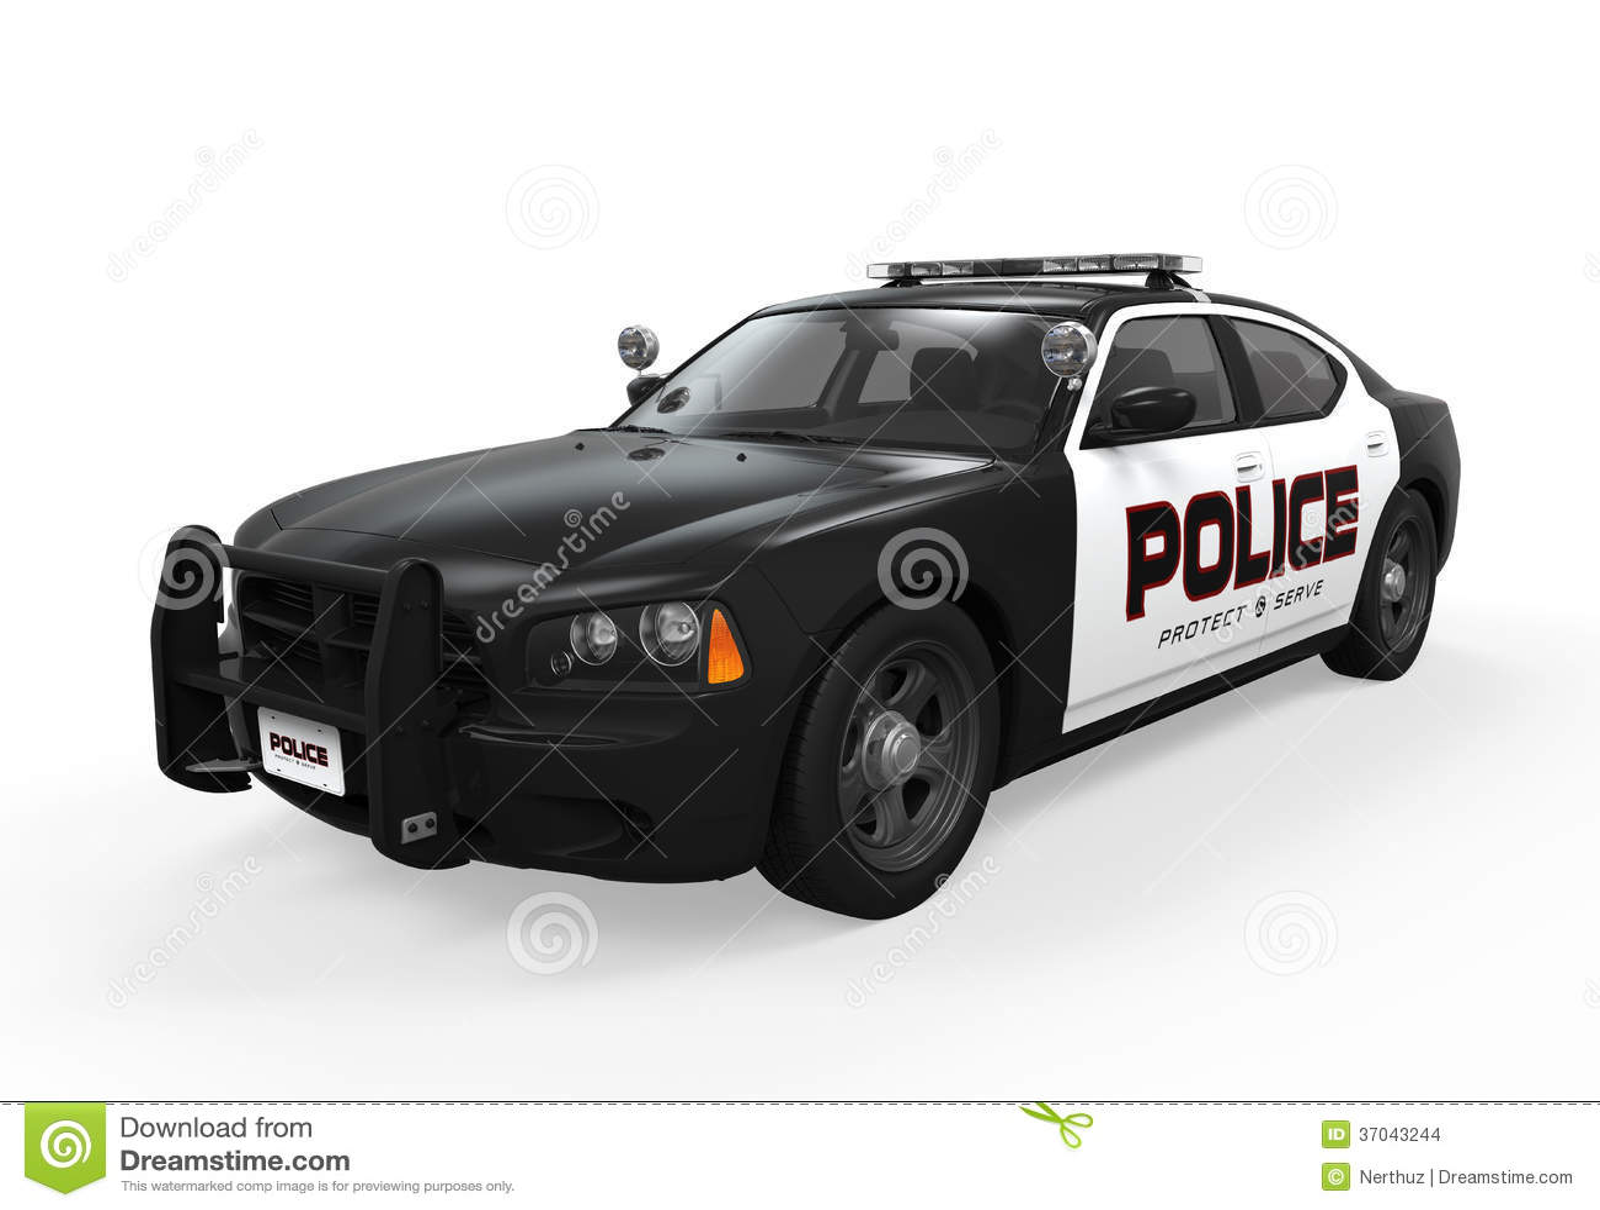 Police Car on white background. 3D render.